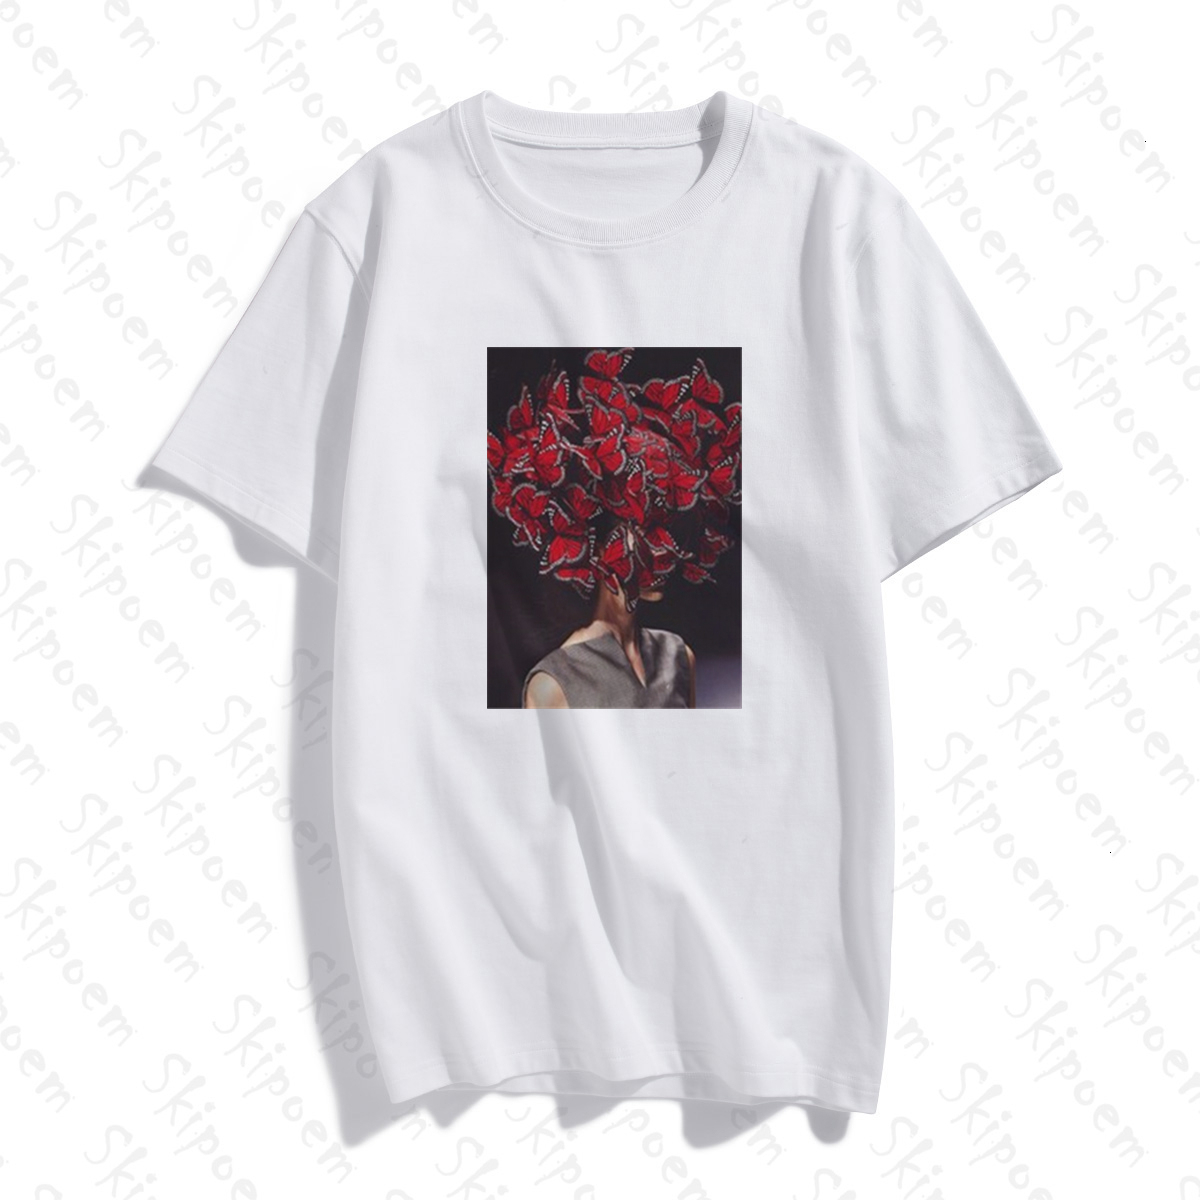 2020 New Butterflyr T-shirt Women Kawaii Vintage Tumblr Punk Gothic Aesthetic Plus Size Short Sleeve Cotton Clothes Streetwear